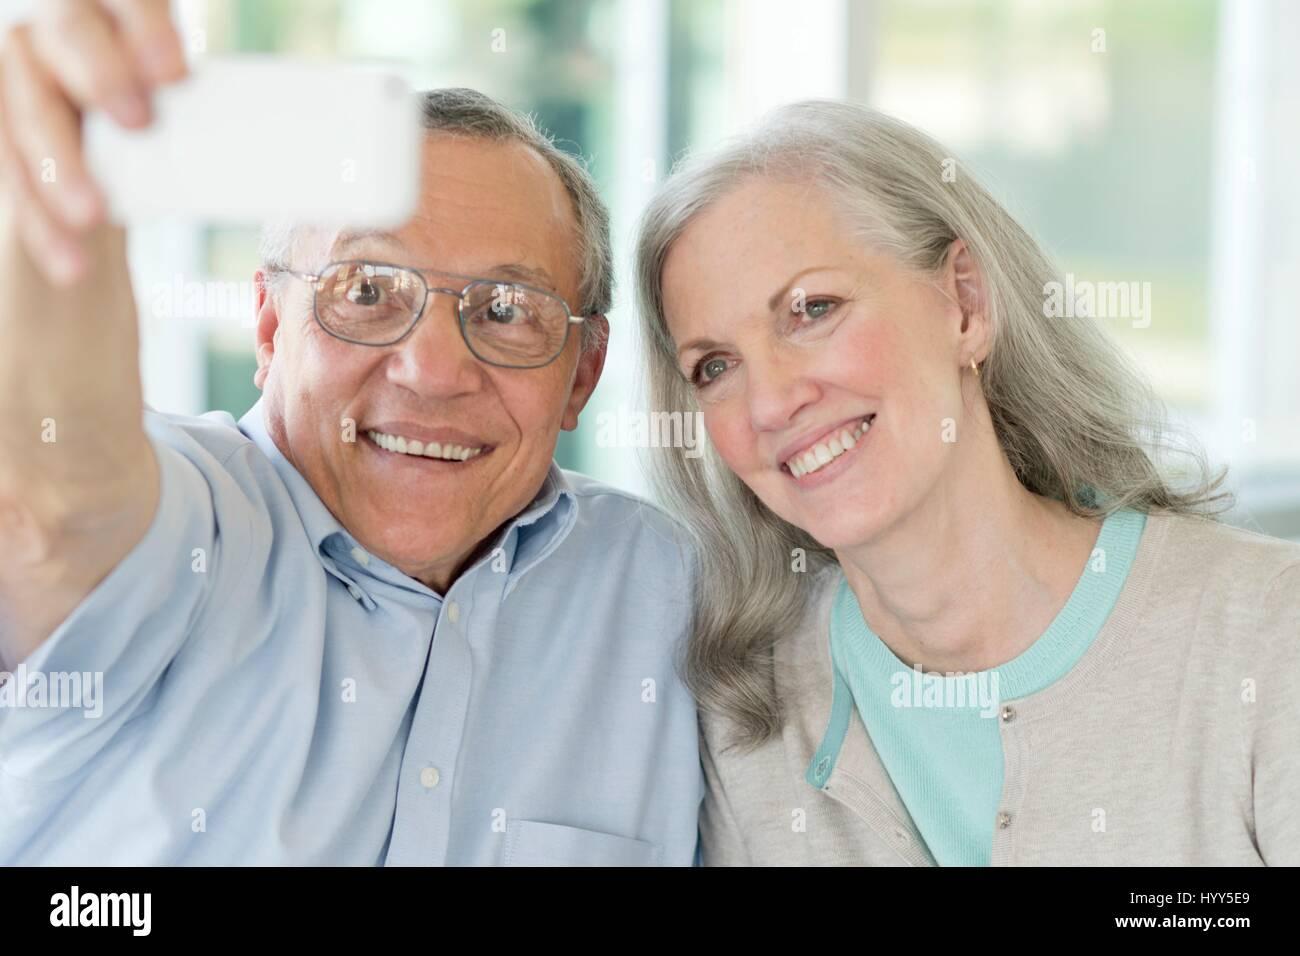 Retrato de pareja teniendo selfie senior en el teléfono. Imagen De Stock